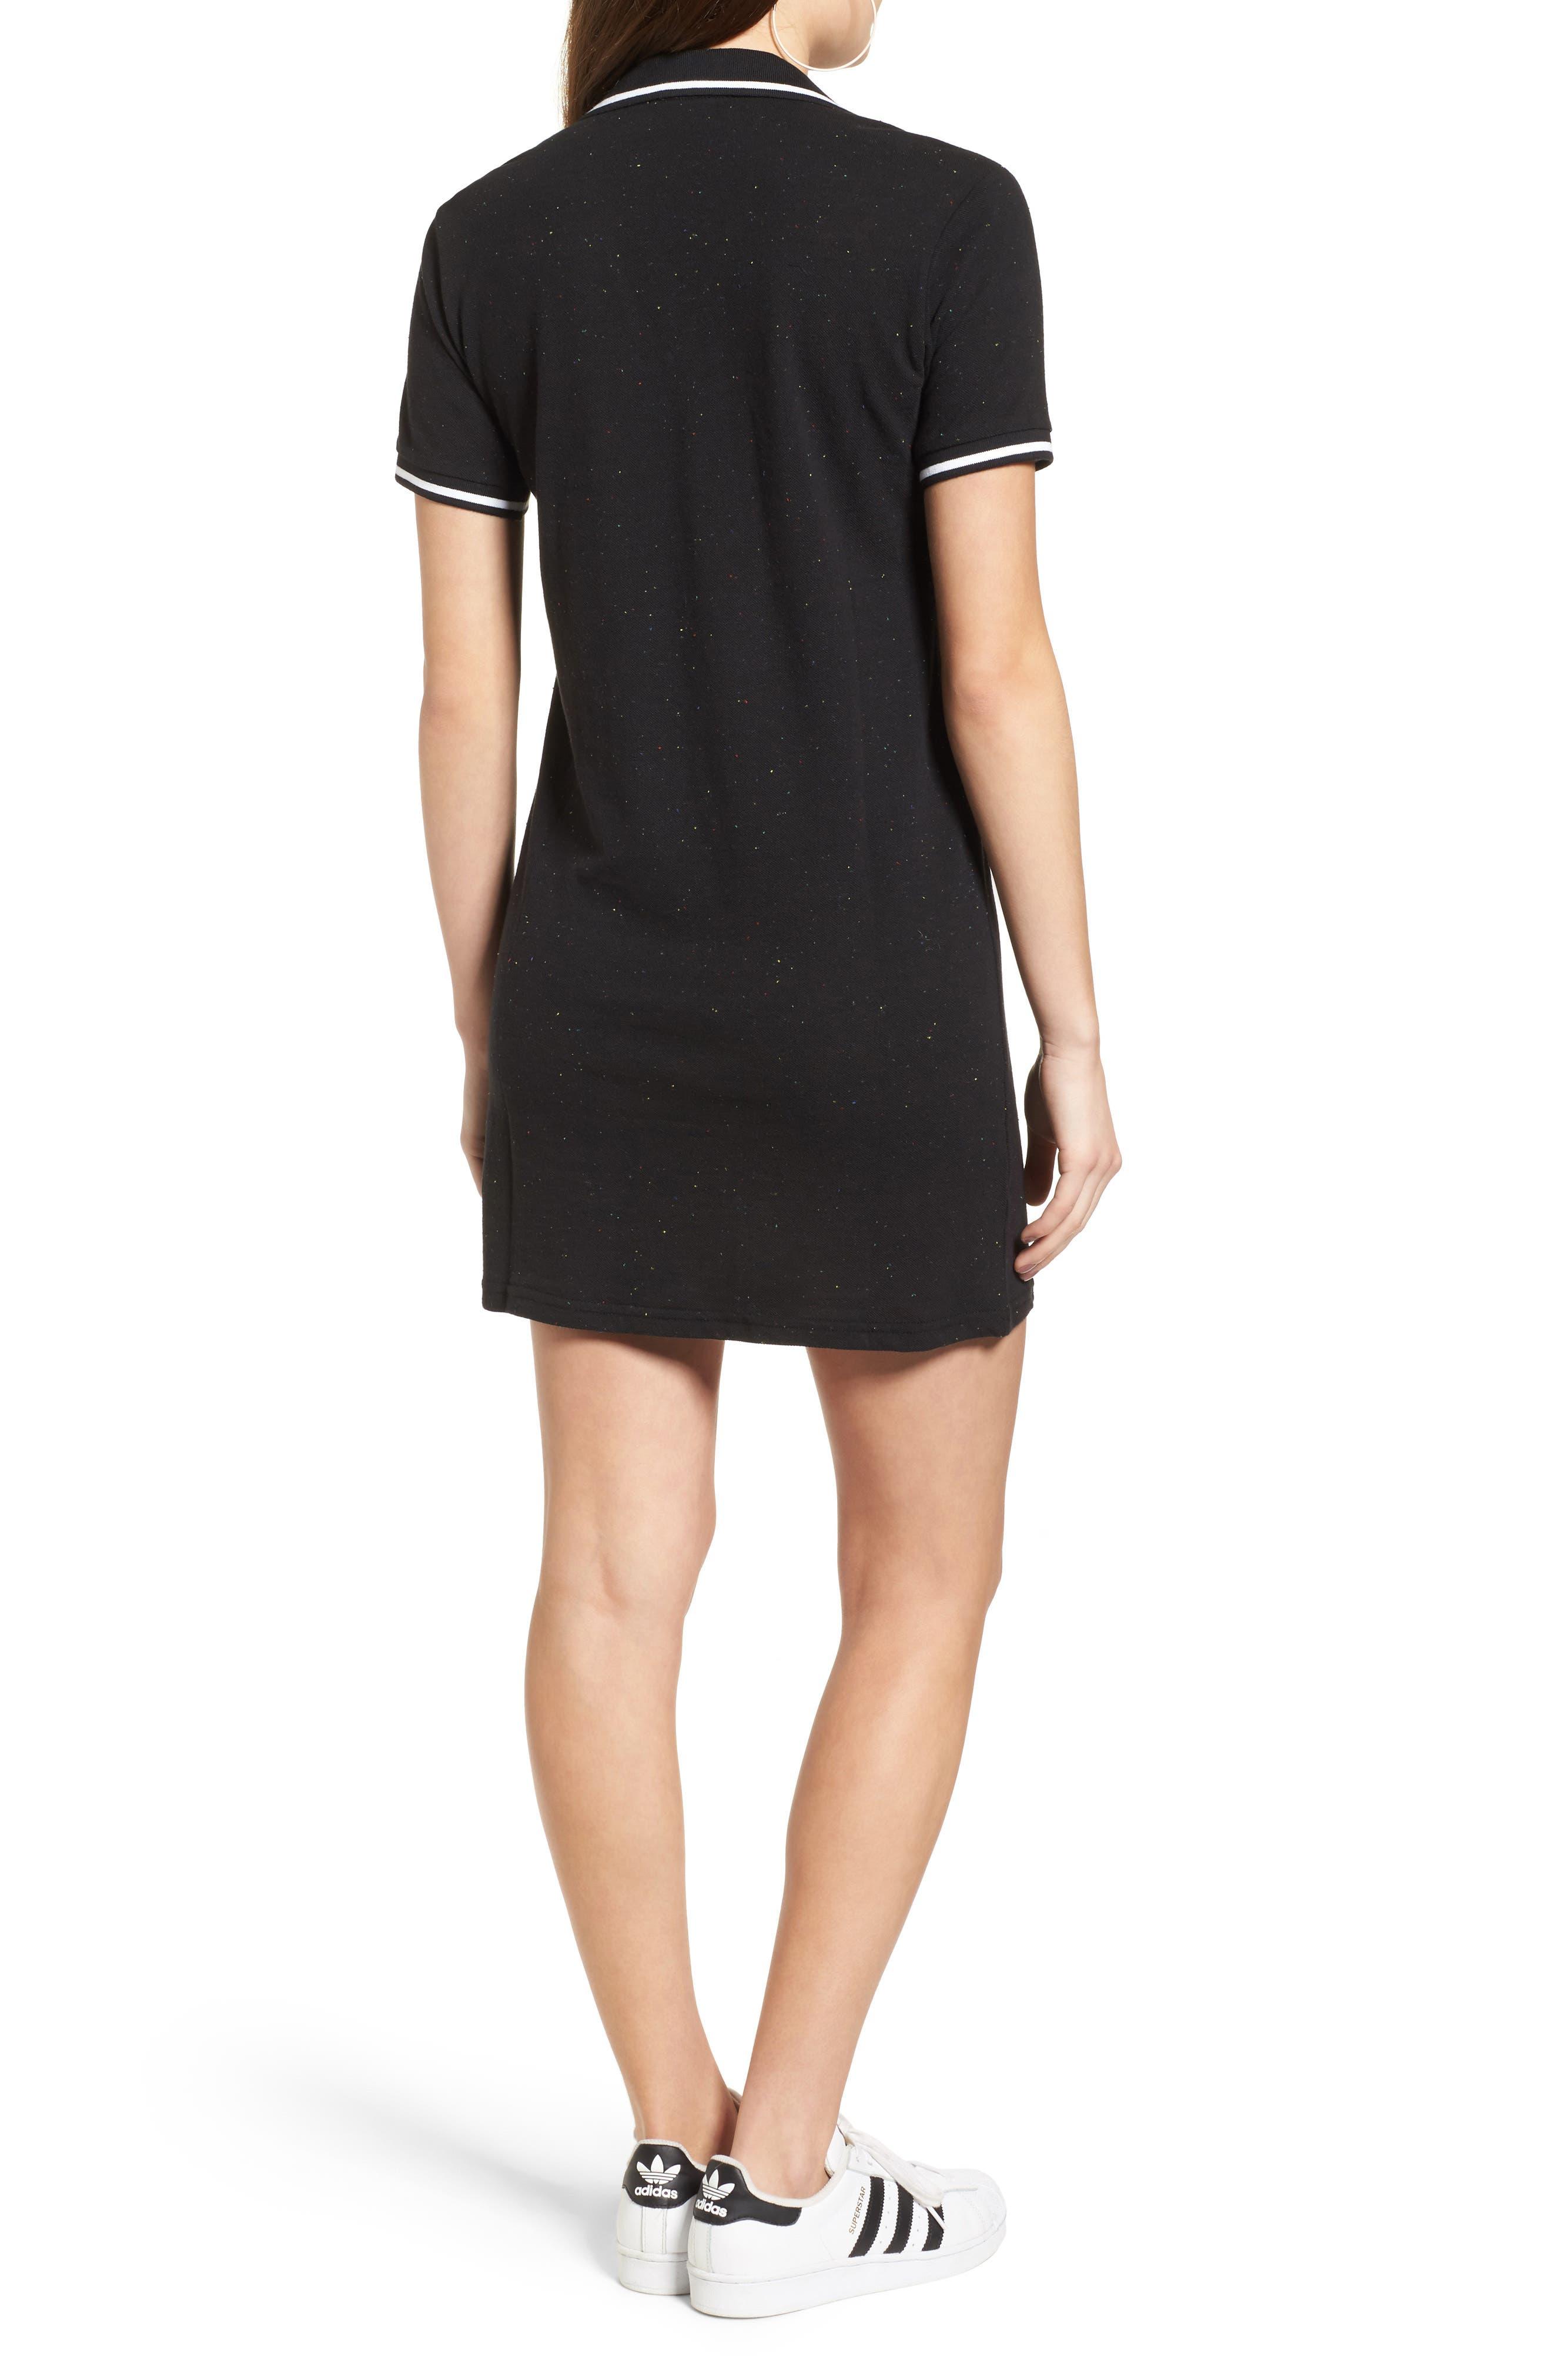 Alternate Image 2  - Obey No. 89 Stretch Cotton Polo Dress